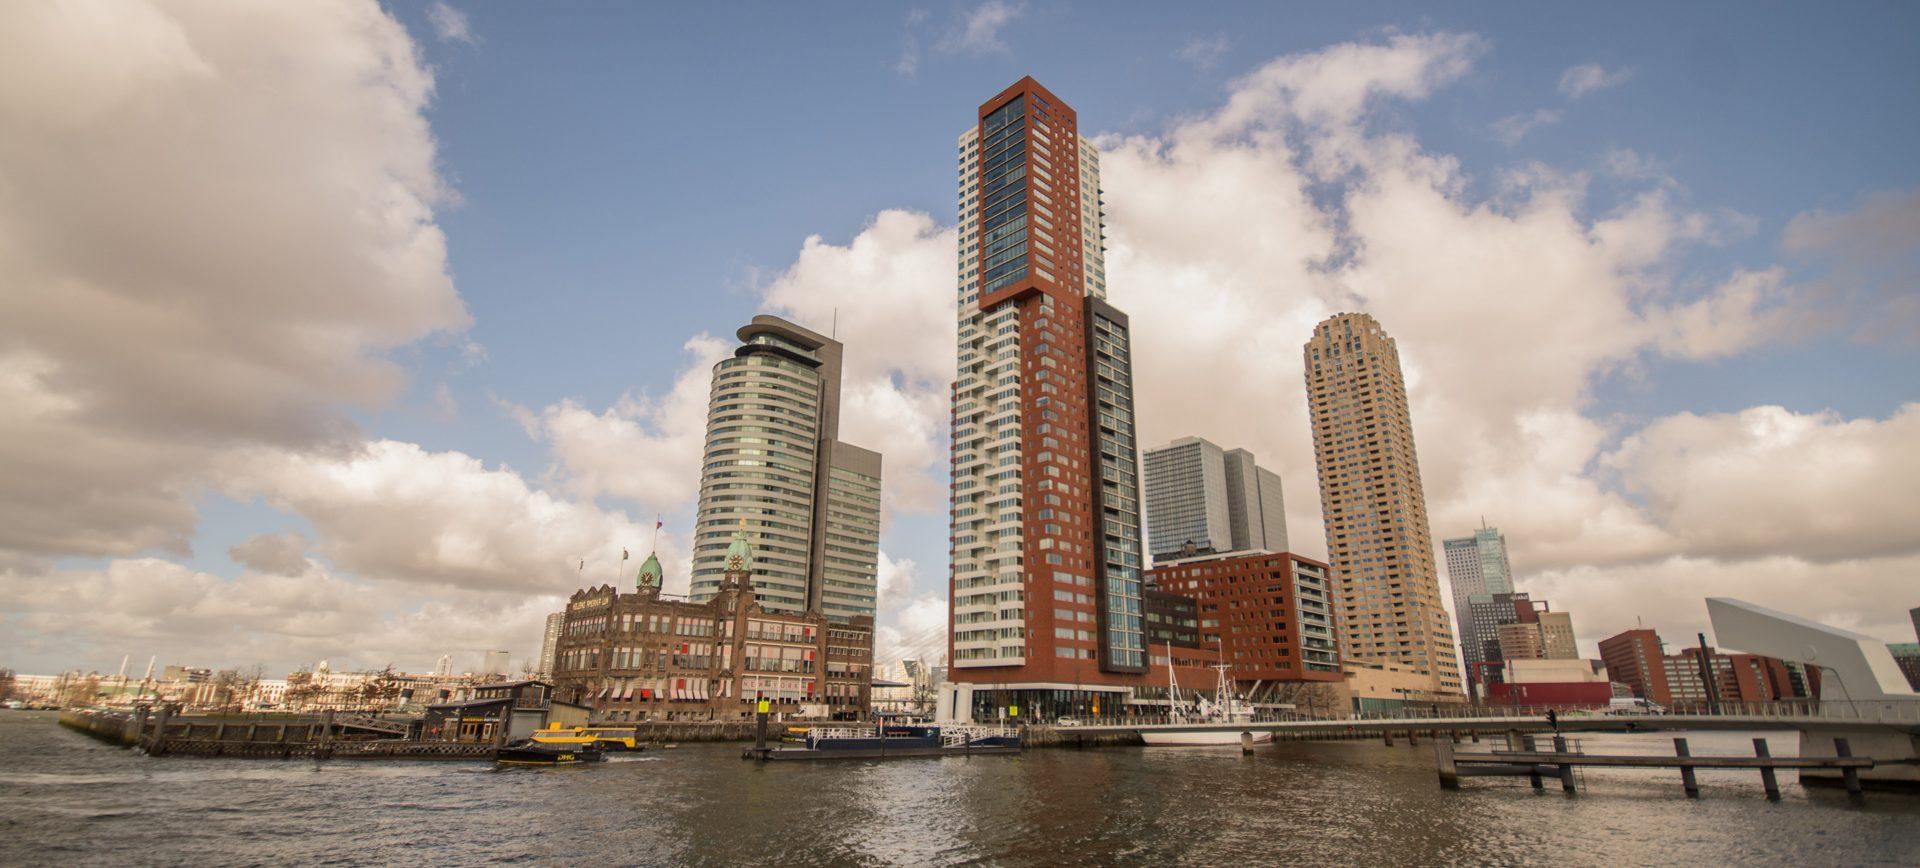 city-sky-water-building